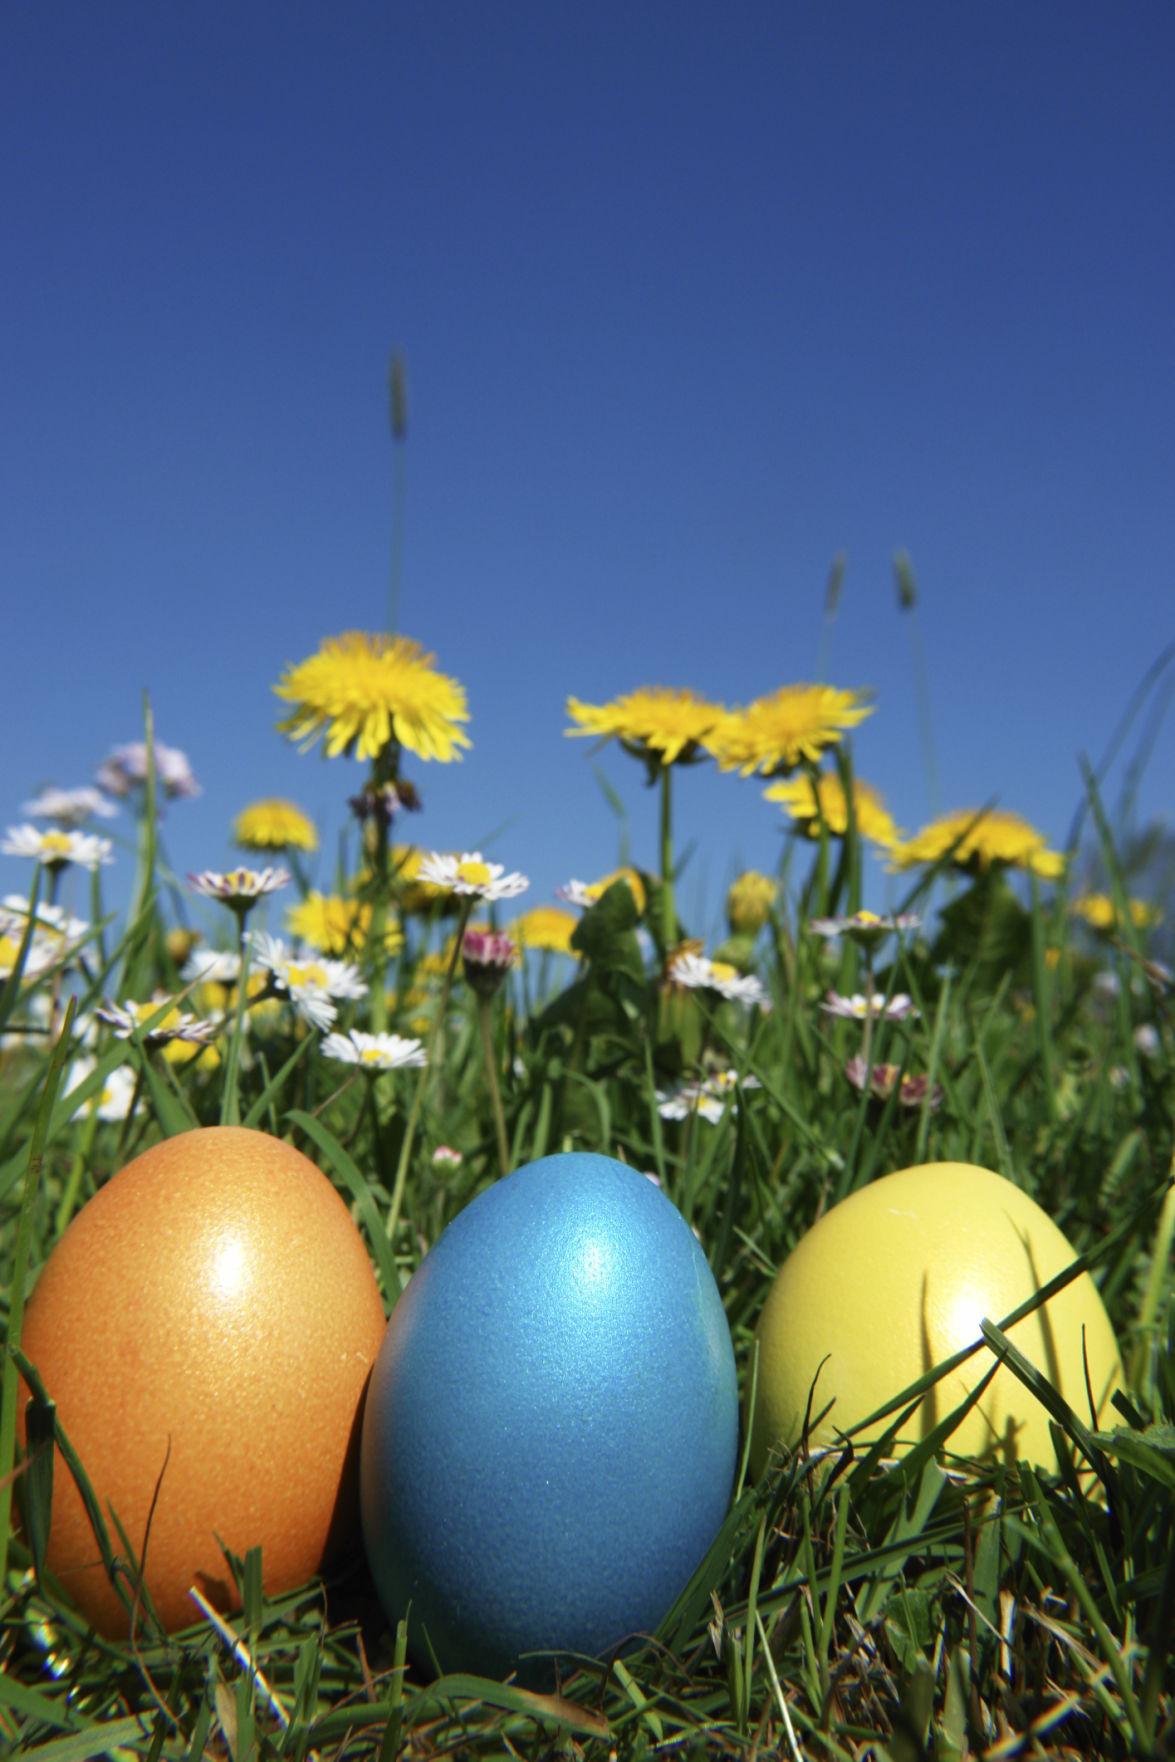 easter egg stockimage